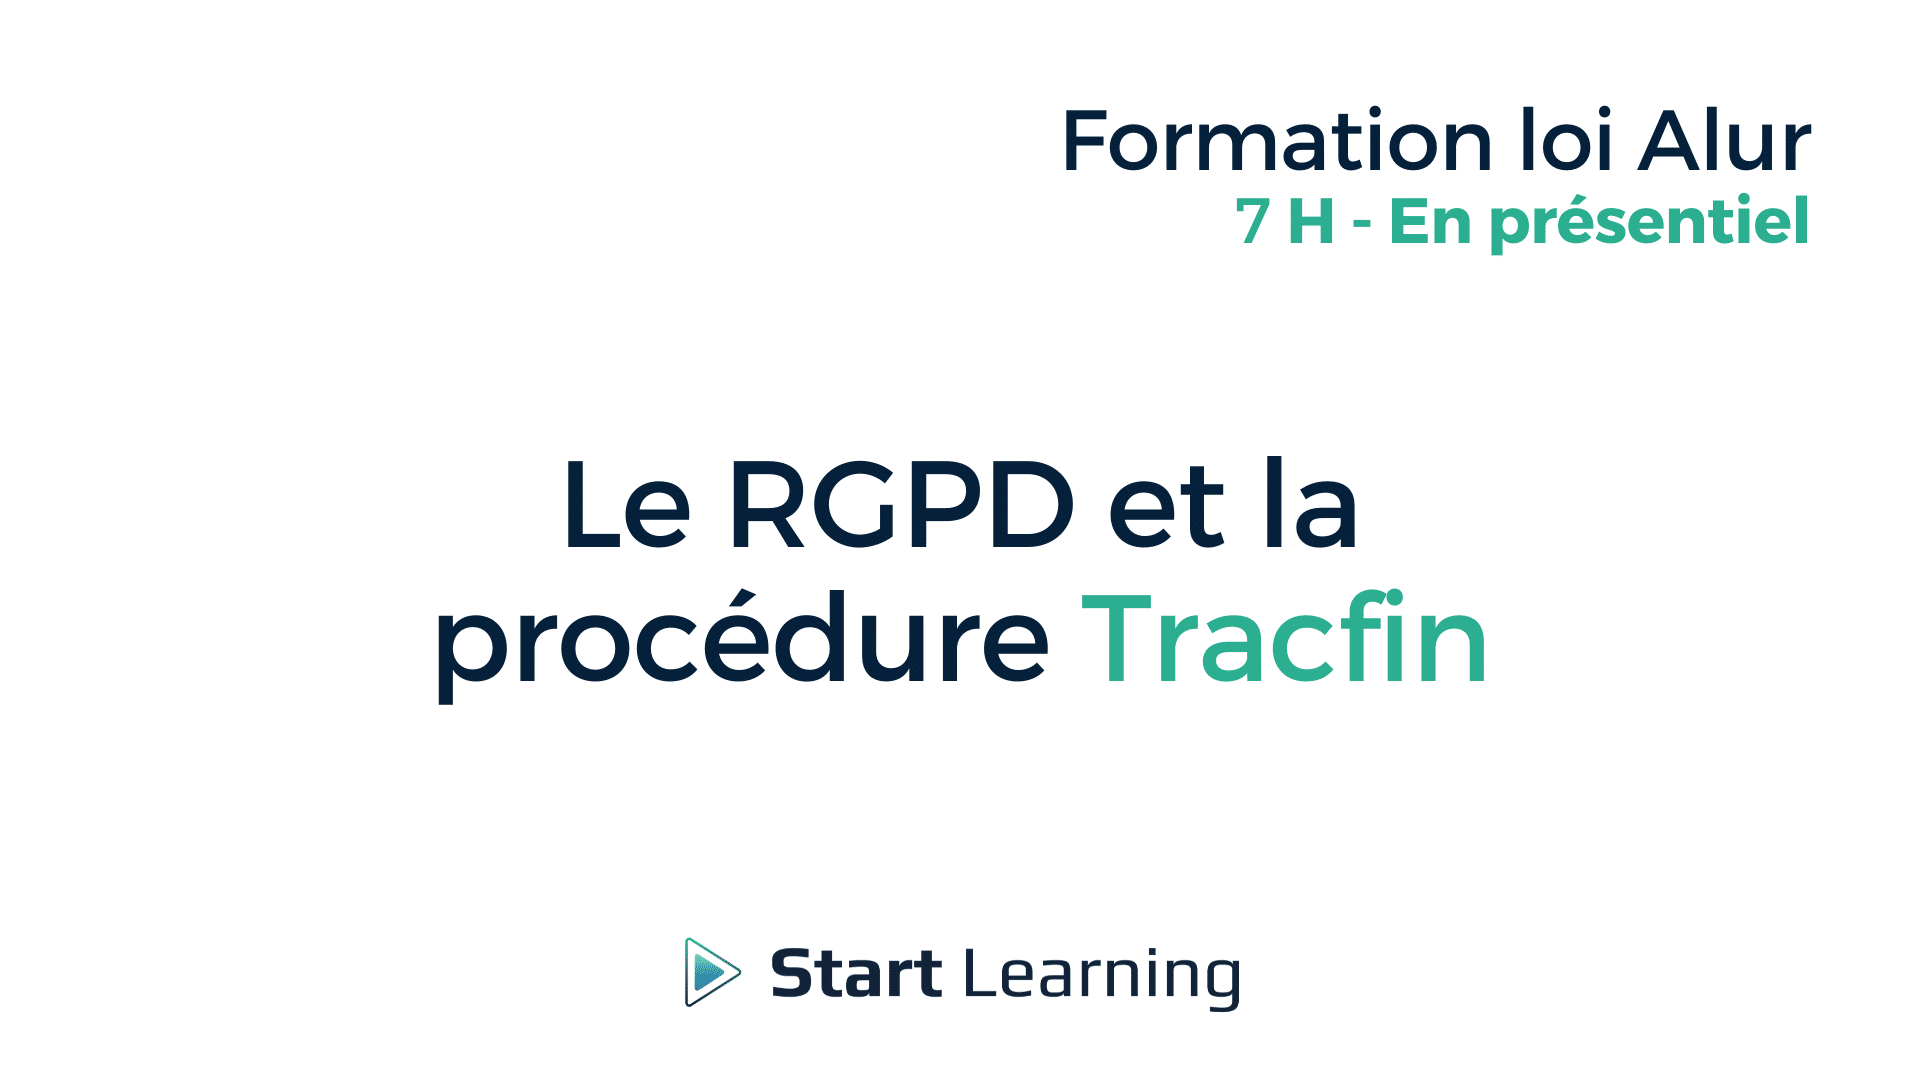 Formation loi Alur - La RGPD et la procédure Tracfin